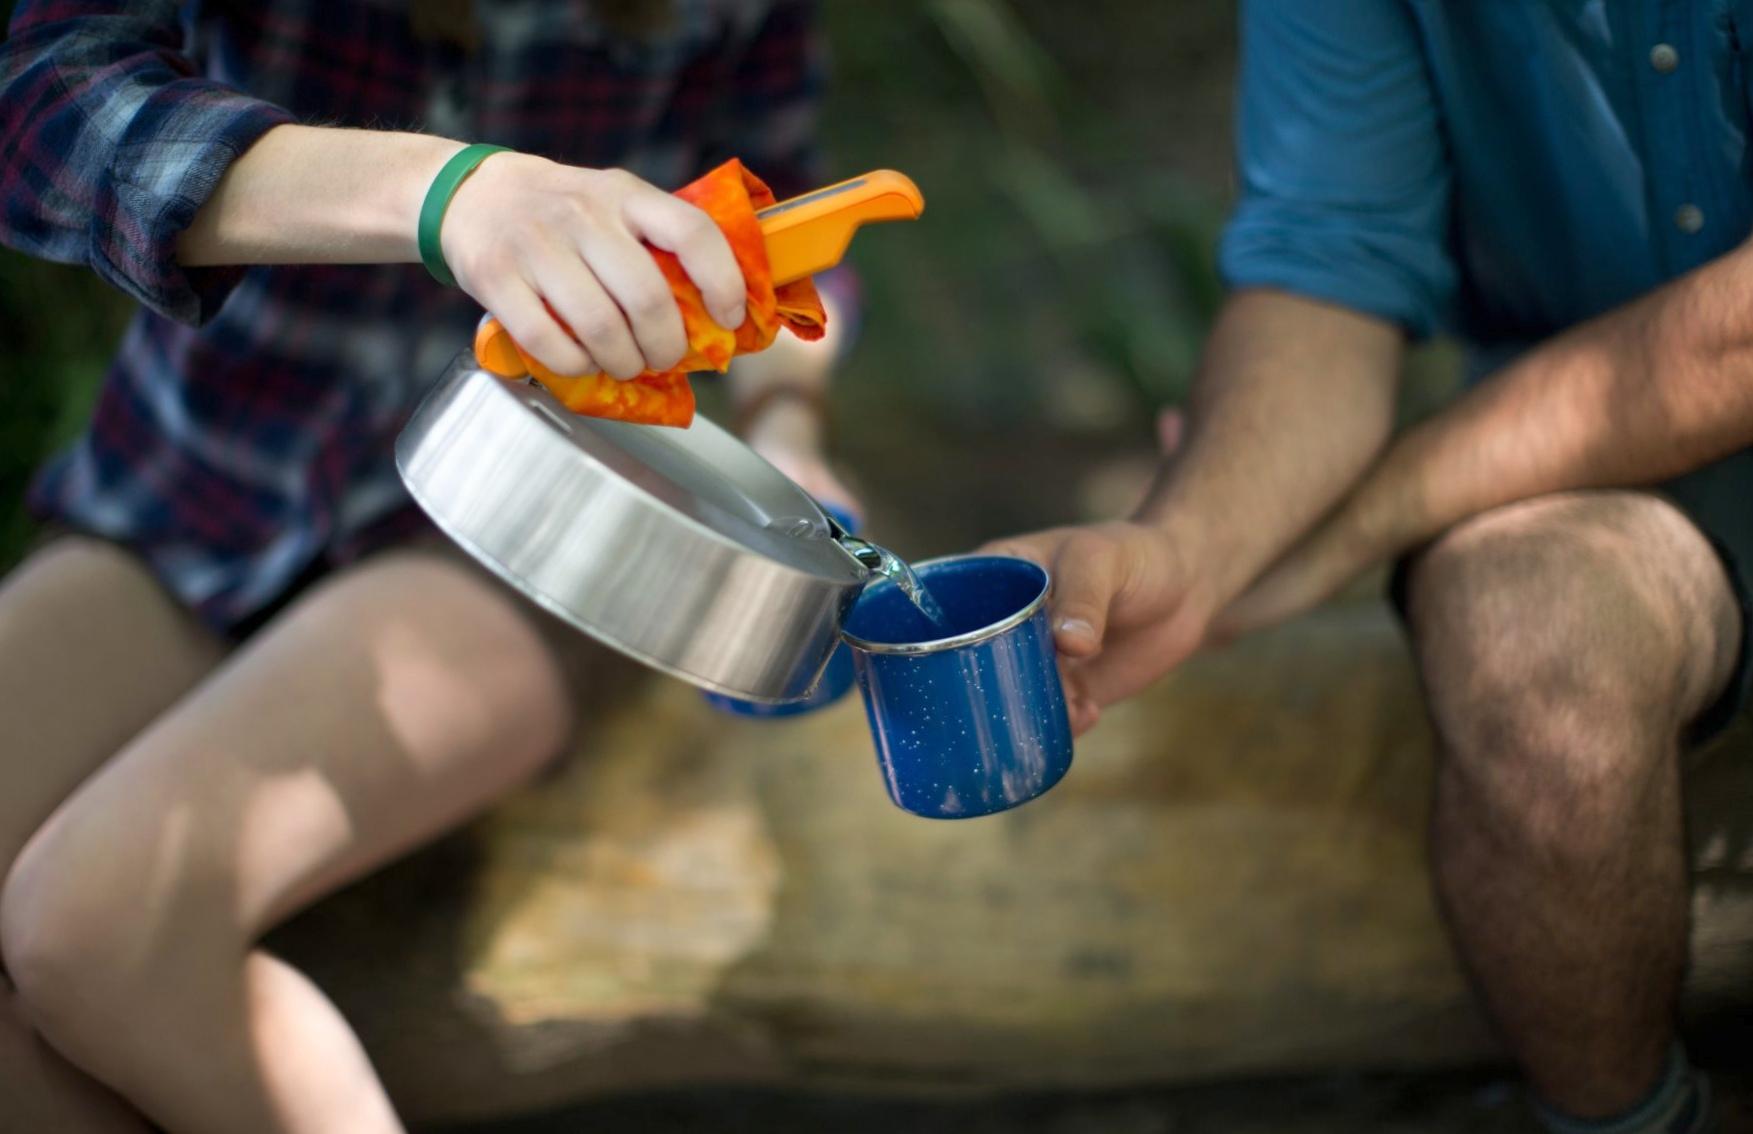 Kettlecharge - электричество от кипячения воды